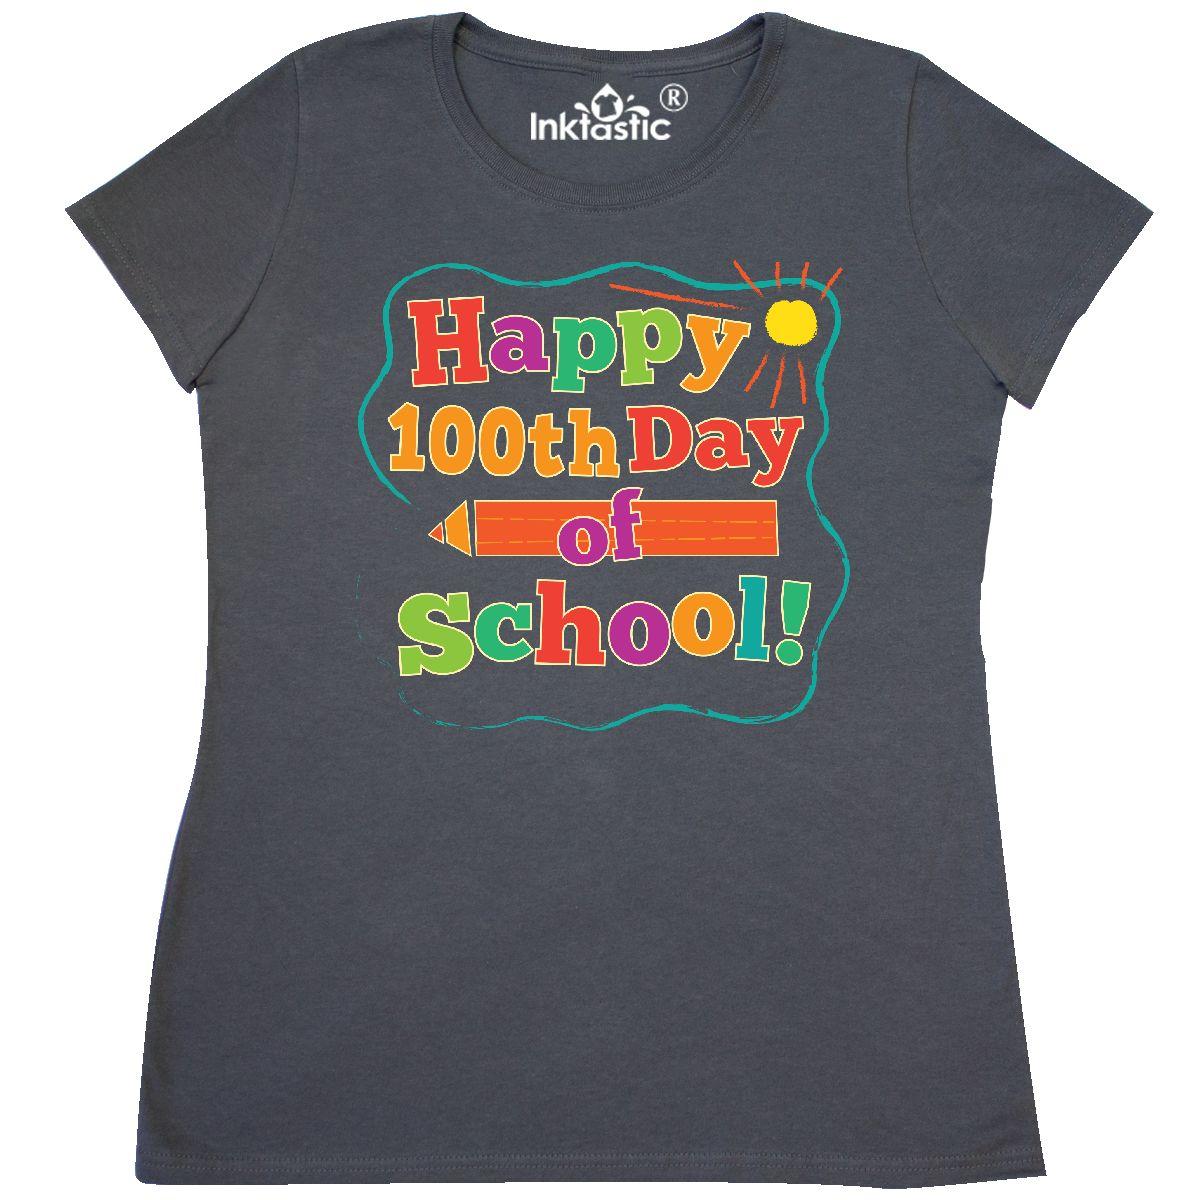 7006d4fe396 Inktastic Happy 100th Day Of School Women s T-Shirt 100 Days Teacher ...